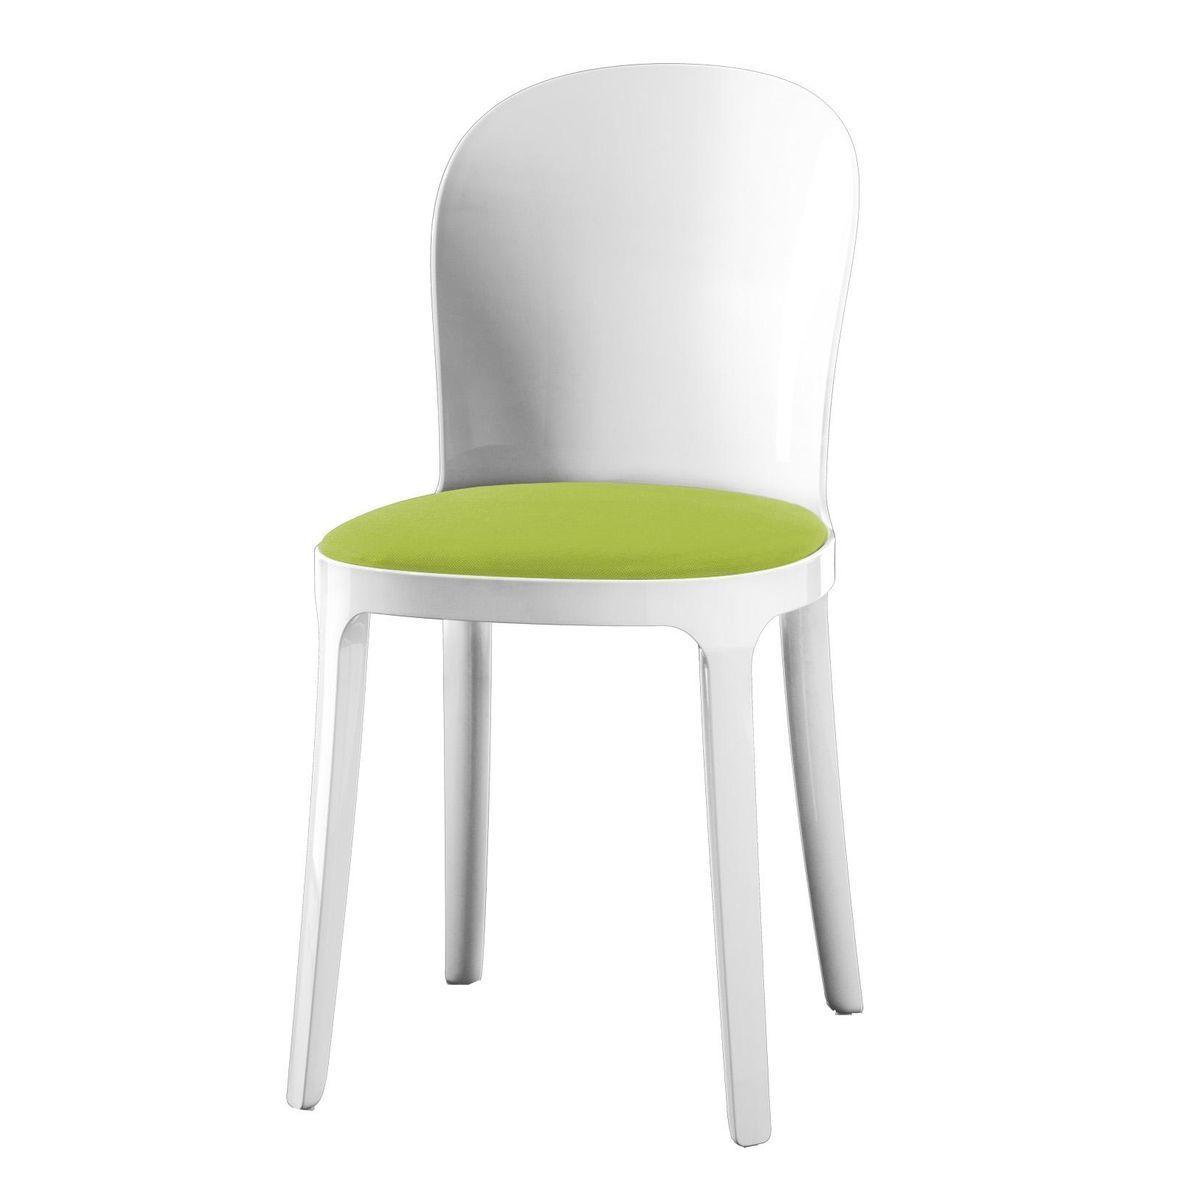 Vanity chair silla blanca magis for Sillas para vanity